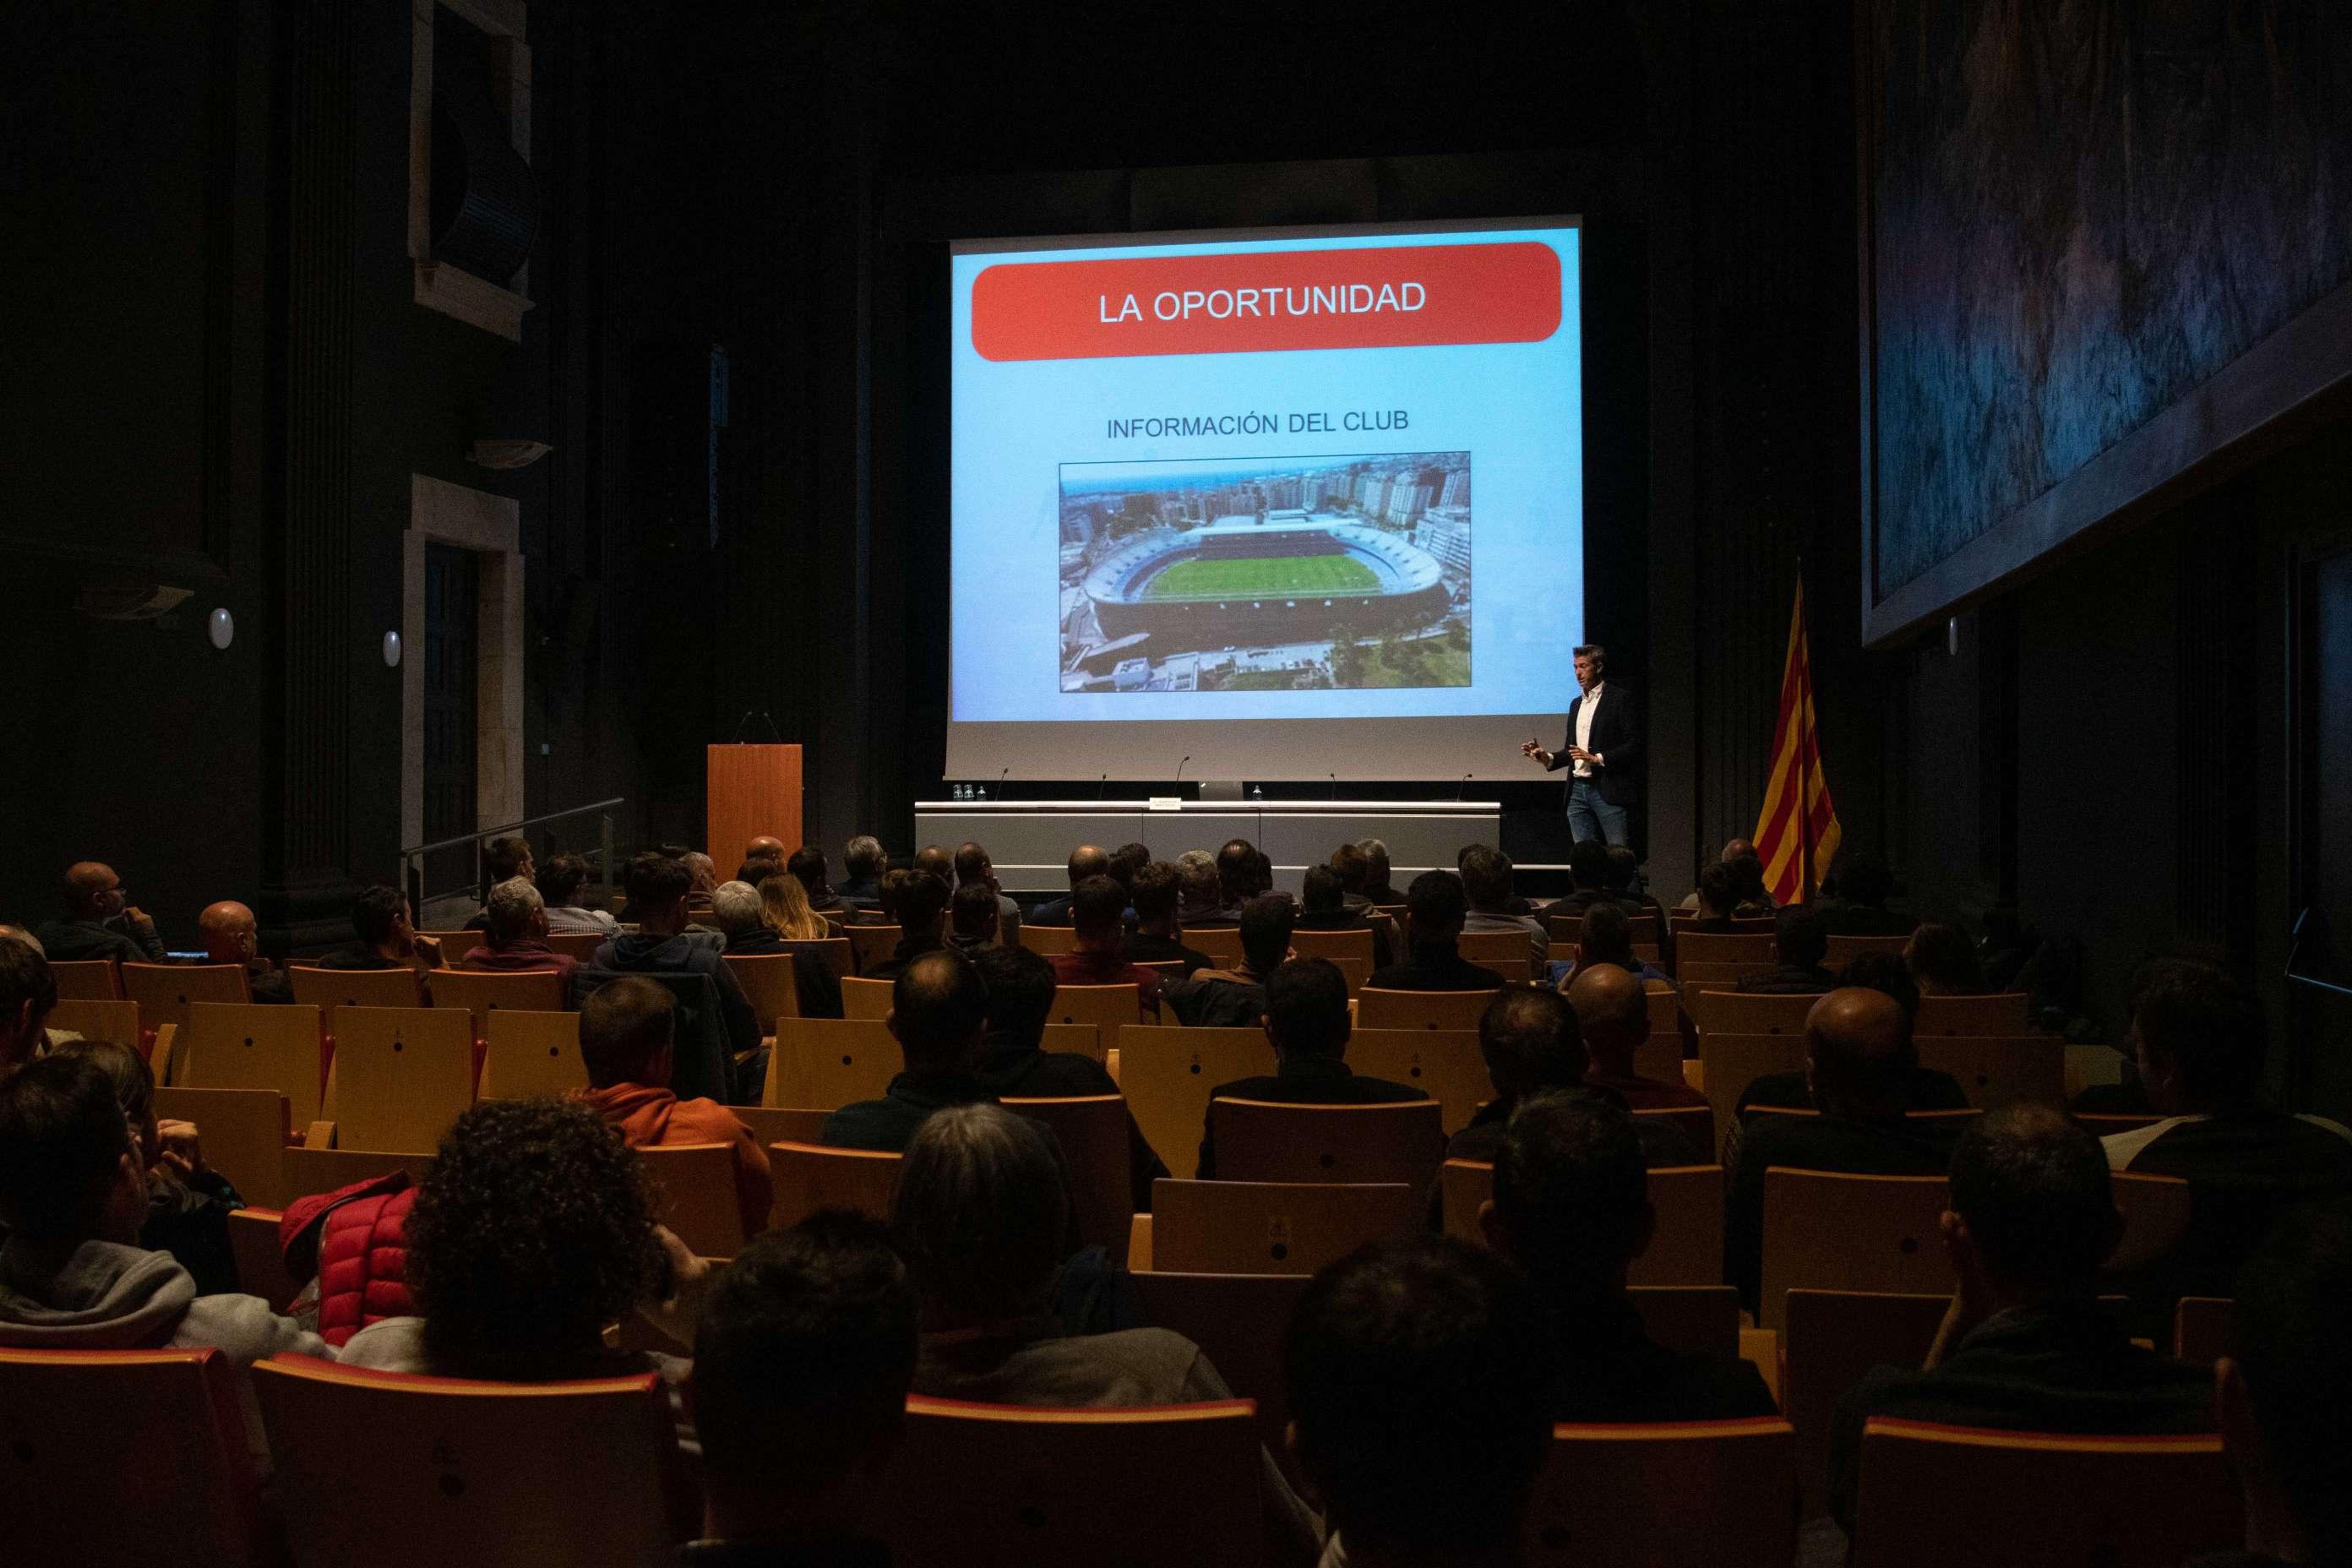 FOTO: Eduard Duran / Girona FC